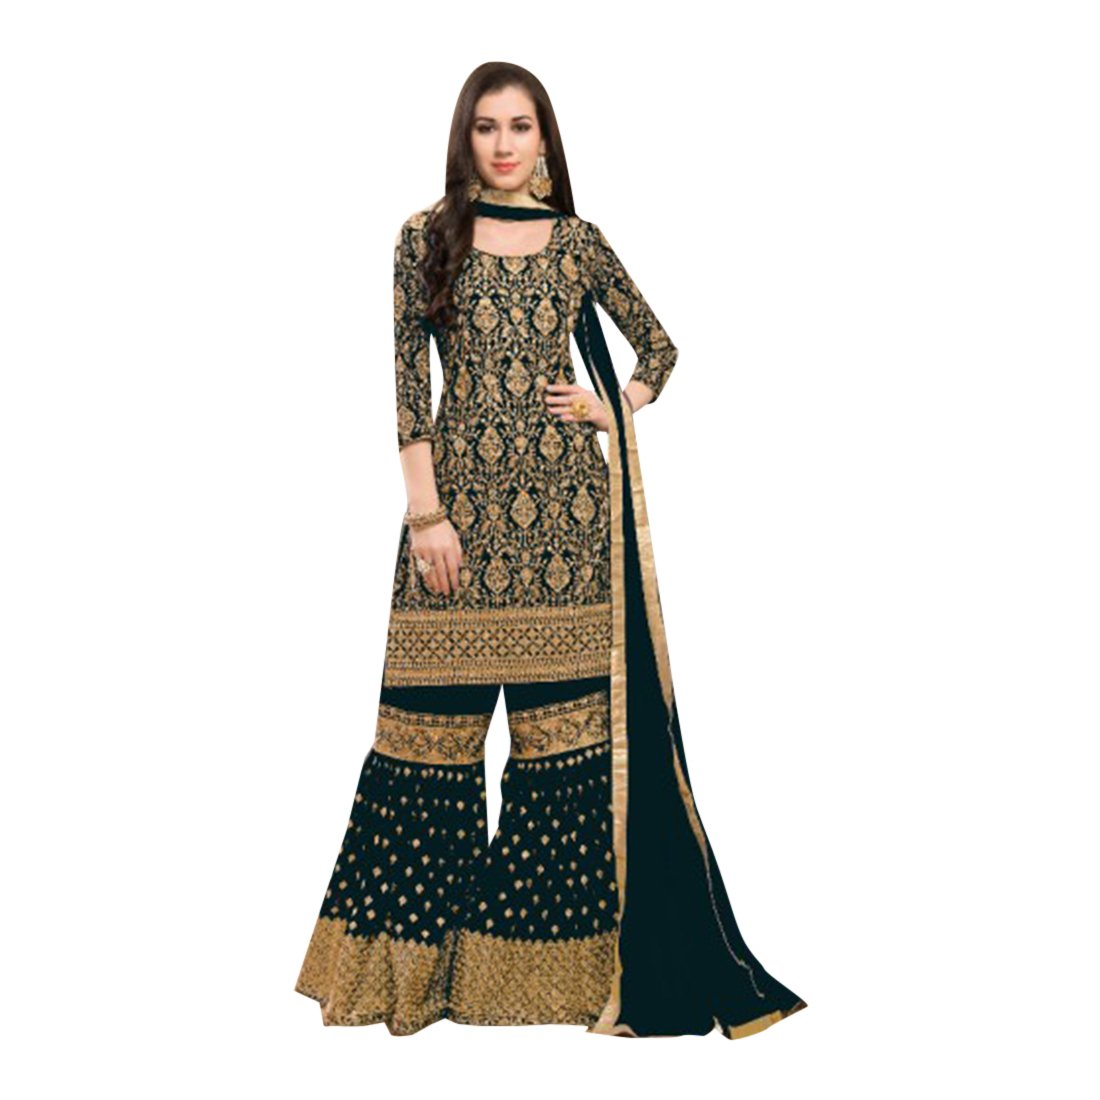 65d3b20255 Amazon.com: Designer Party Wear Garara Palazzo Salwar Kameez Pant Custom to  Measure Indian Ethnic Wear HIT 2724: Clothing